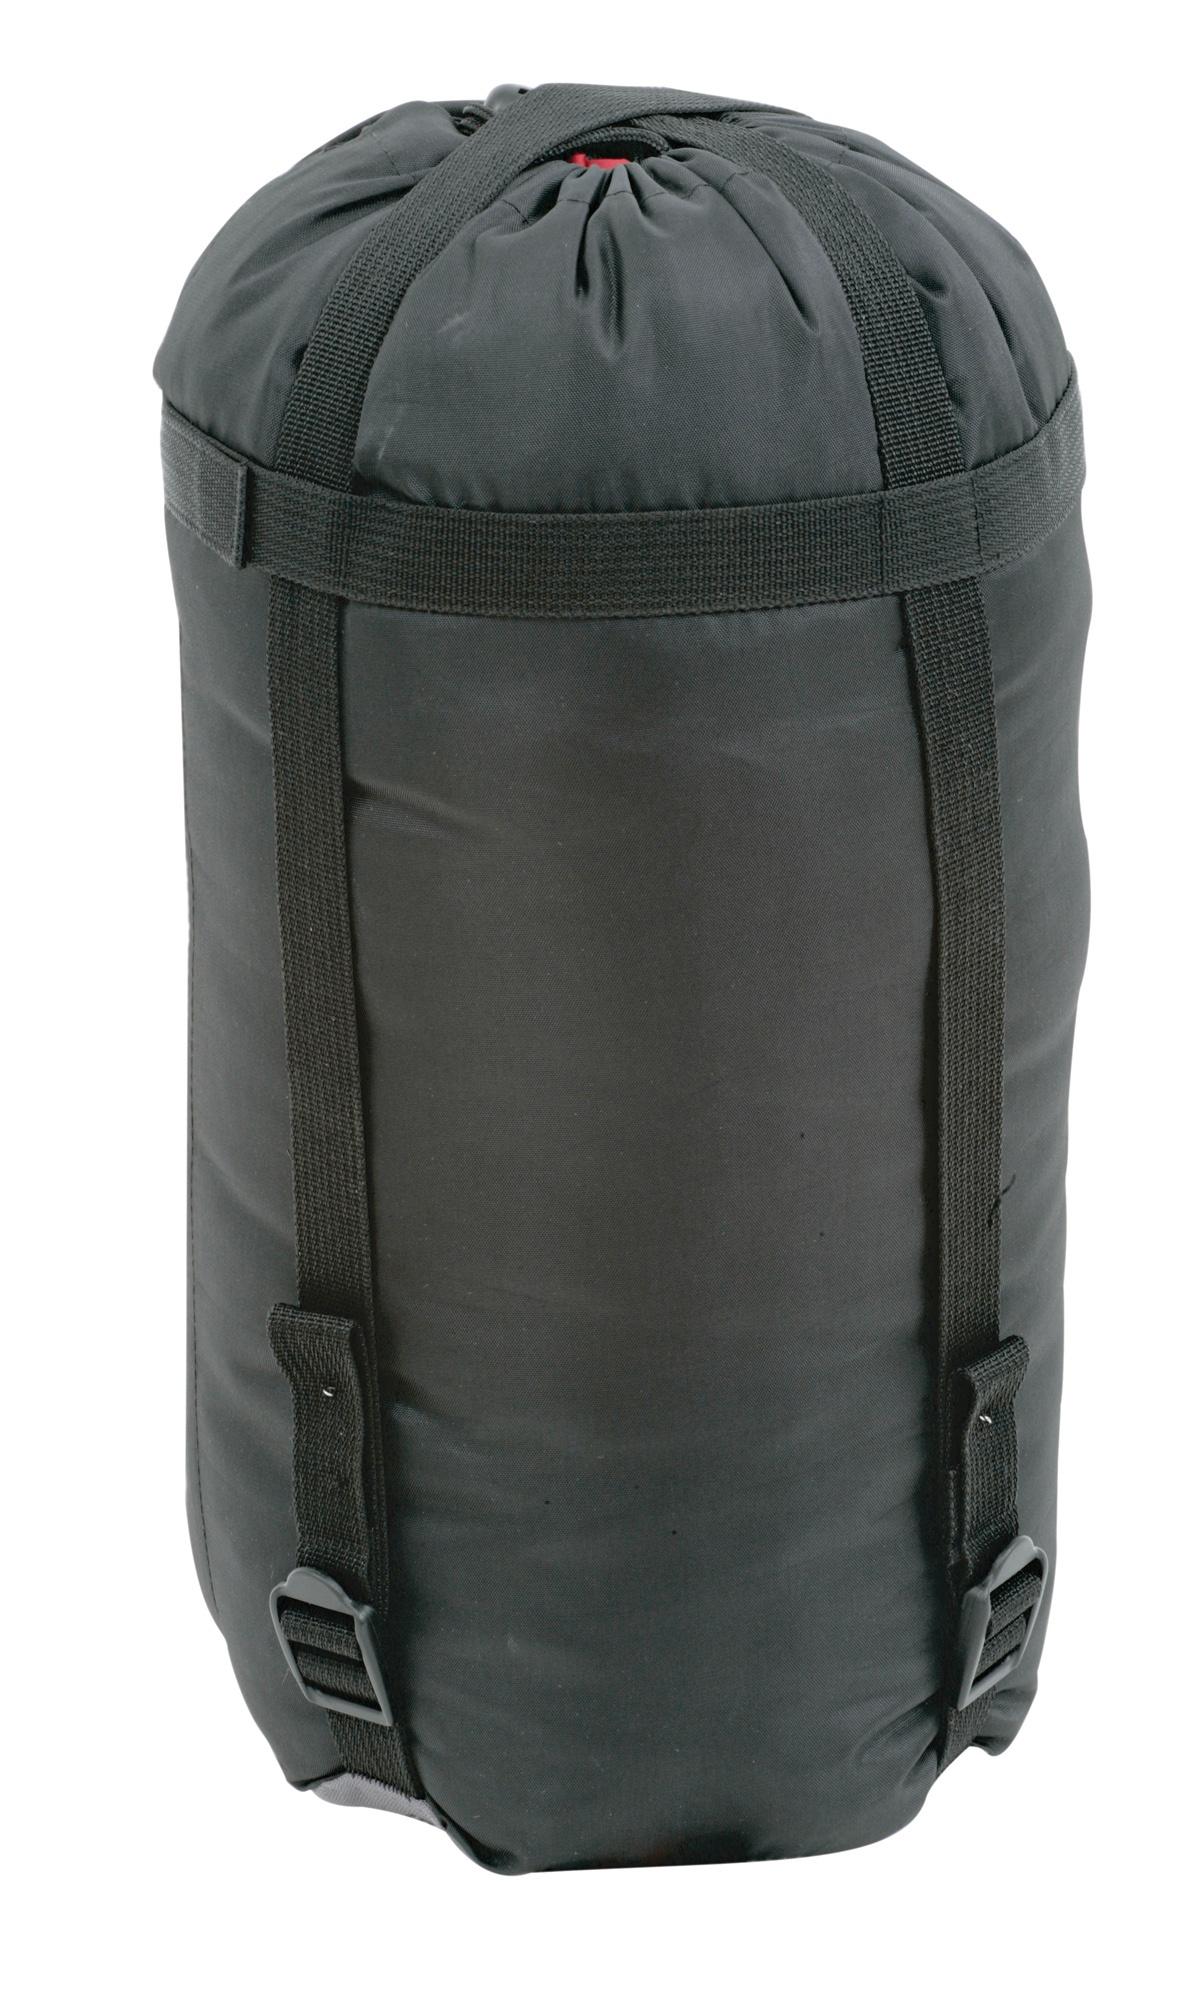 Компрессионный мешок BASK Compression bag V2 черный XL bask andes v2